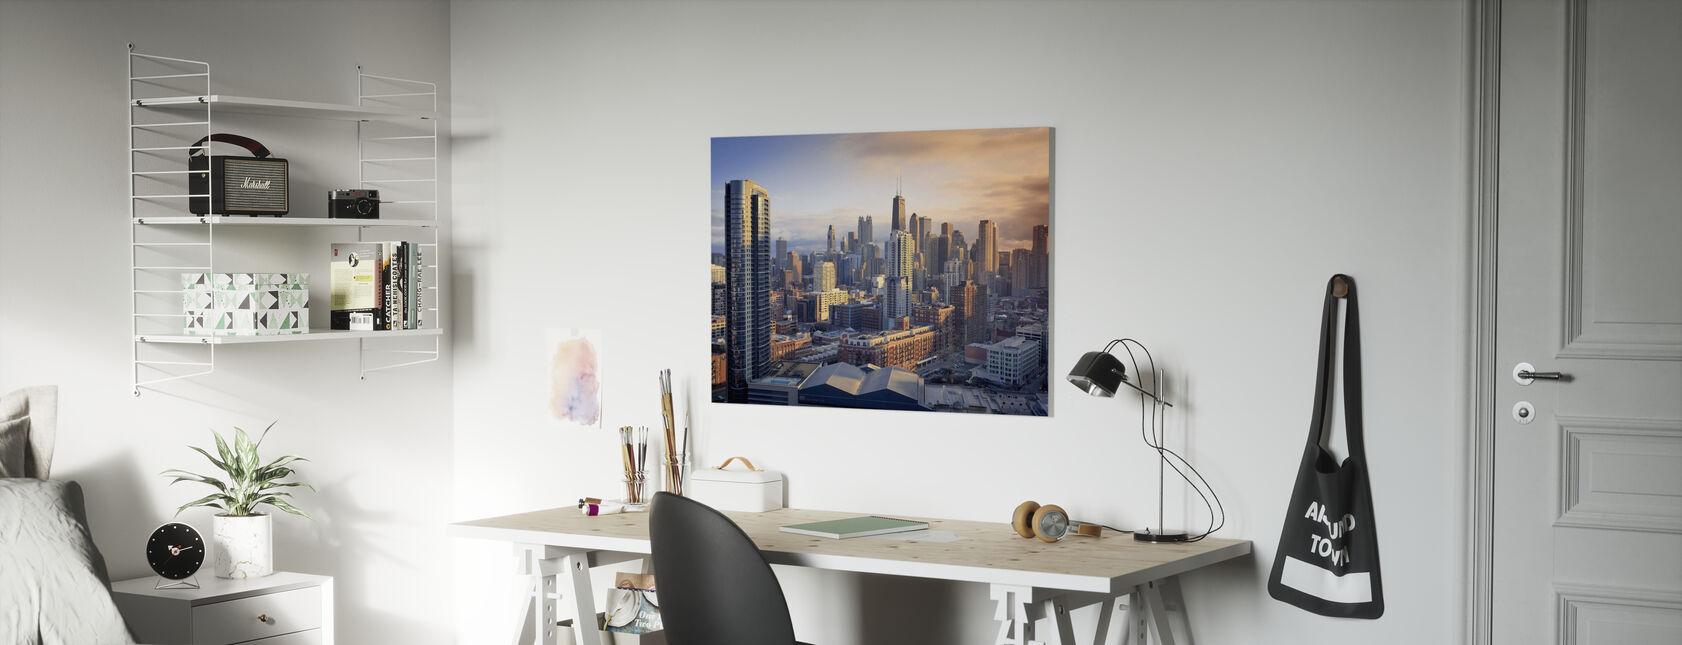 Chicago Symfonie - Canvas print - Kinderkamer